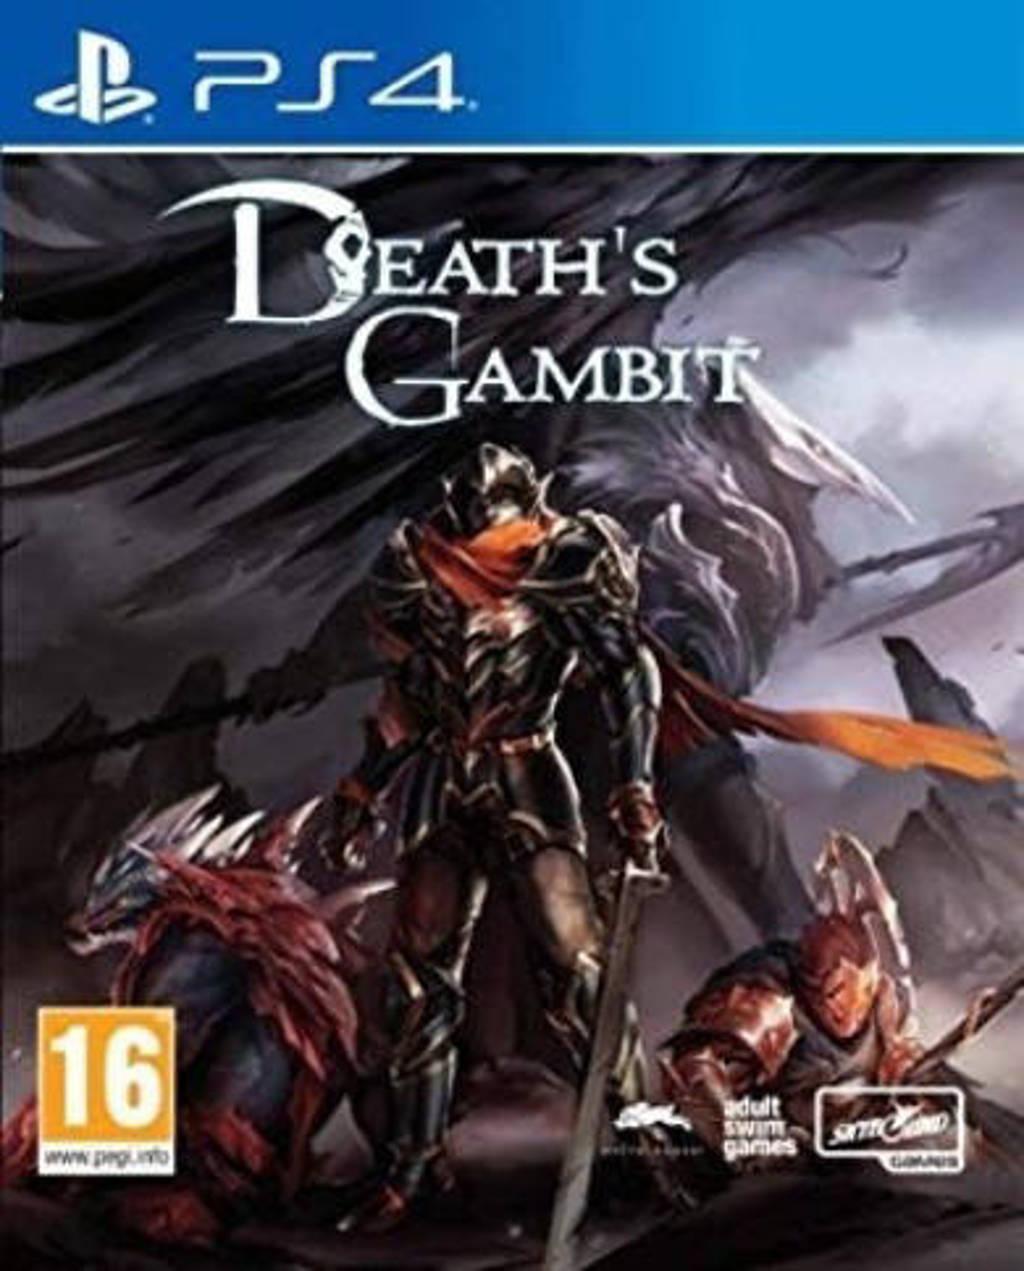 Death's Gambit (PlayStation 4)